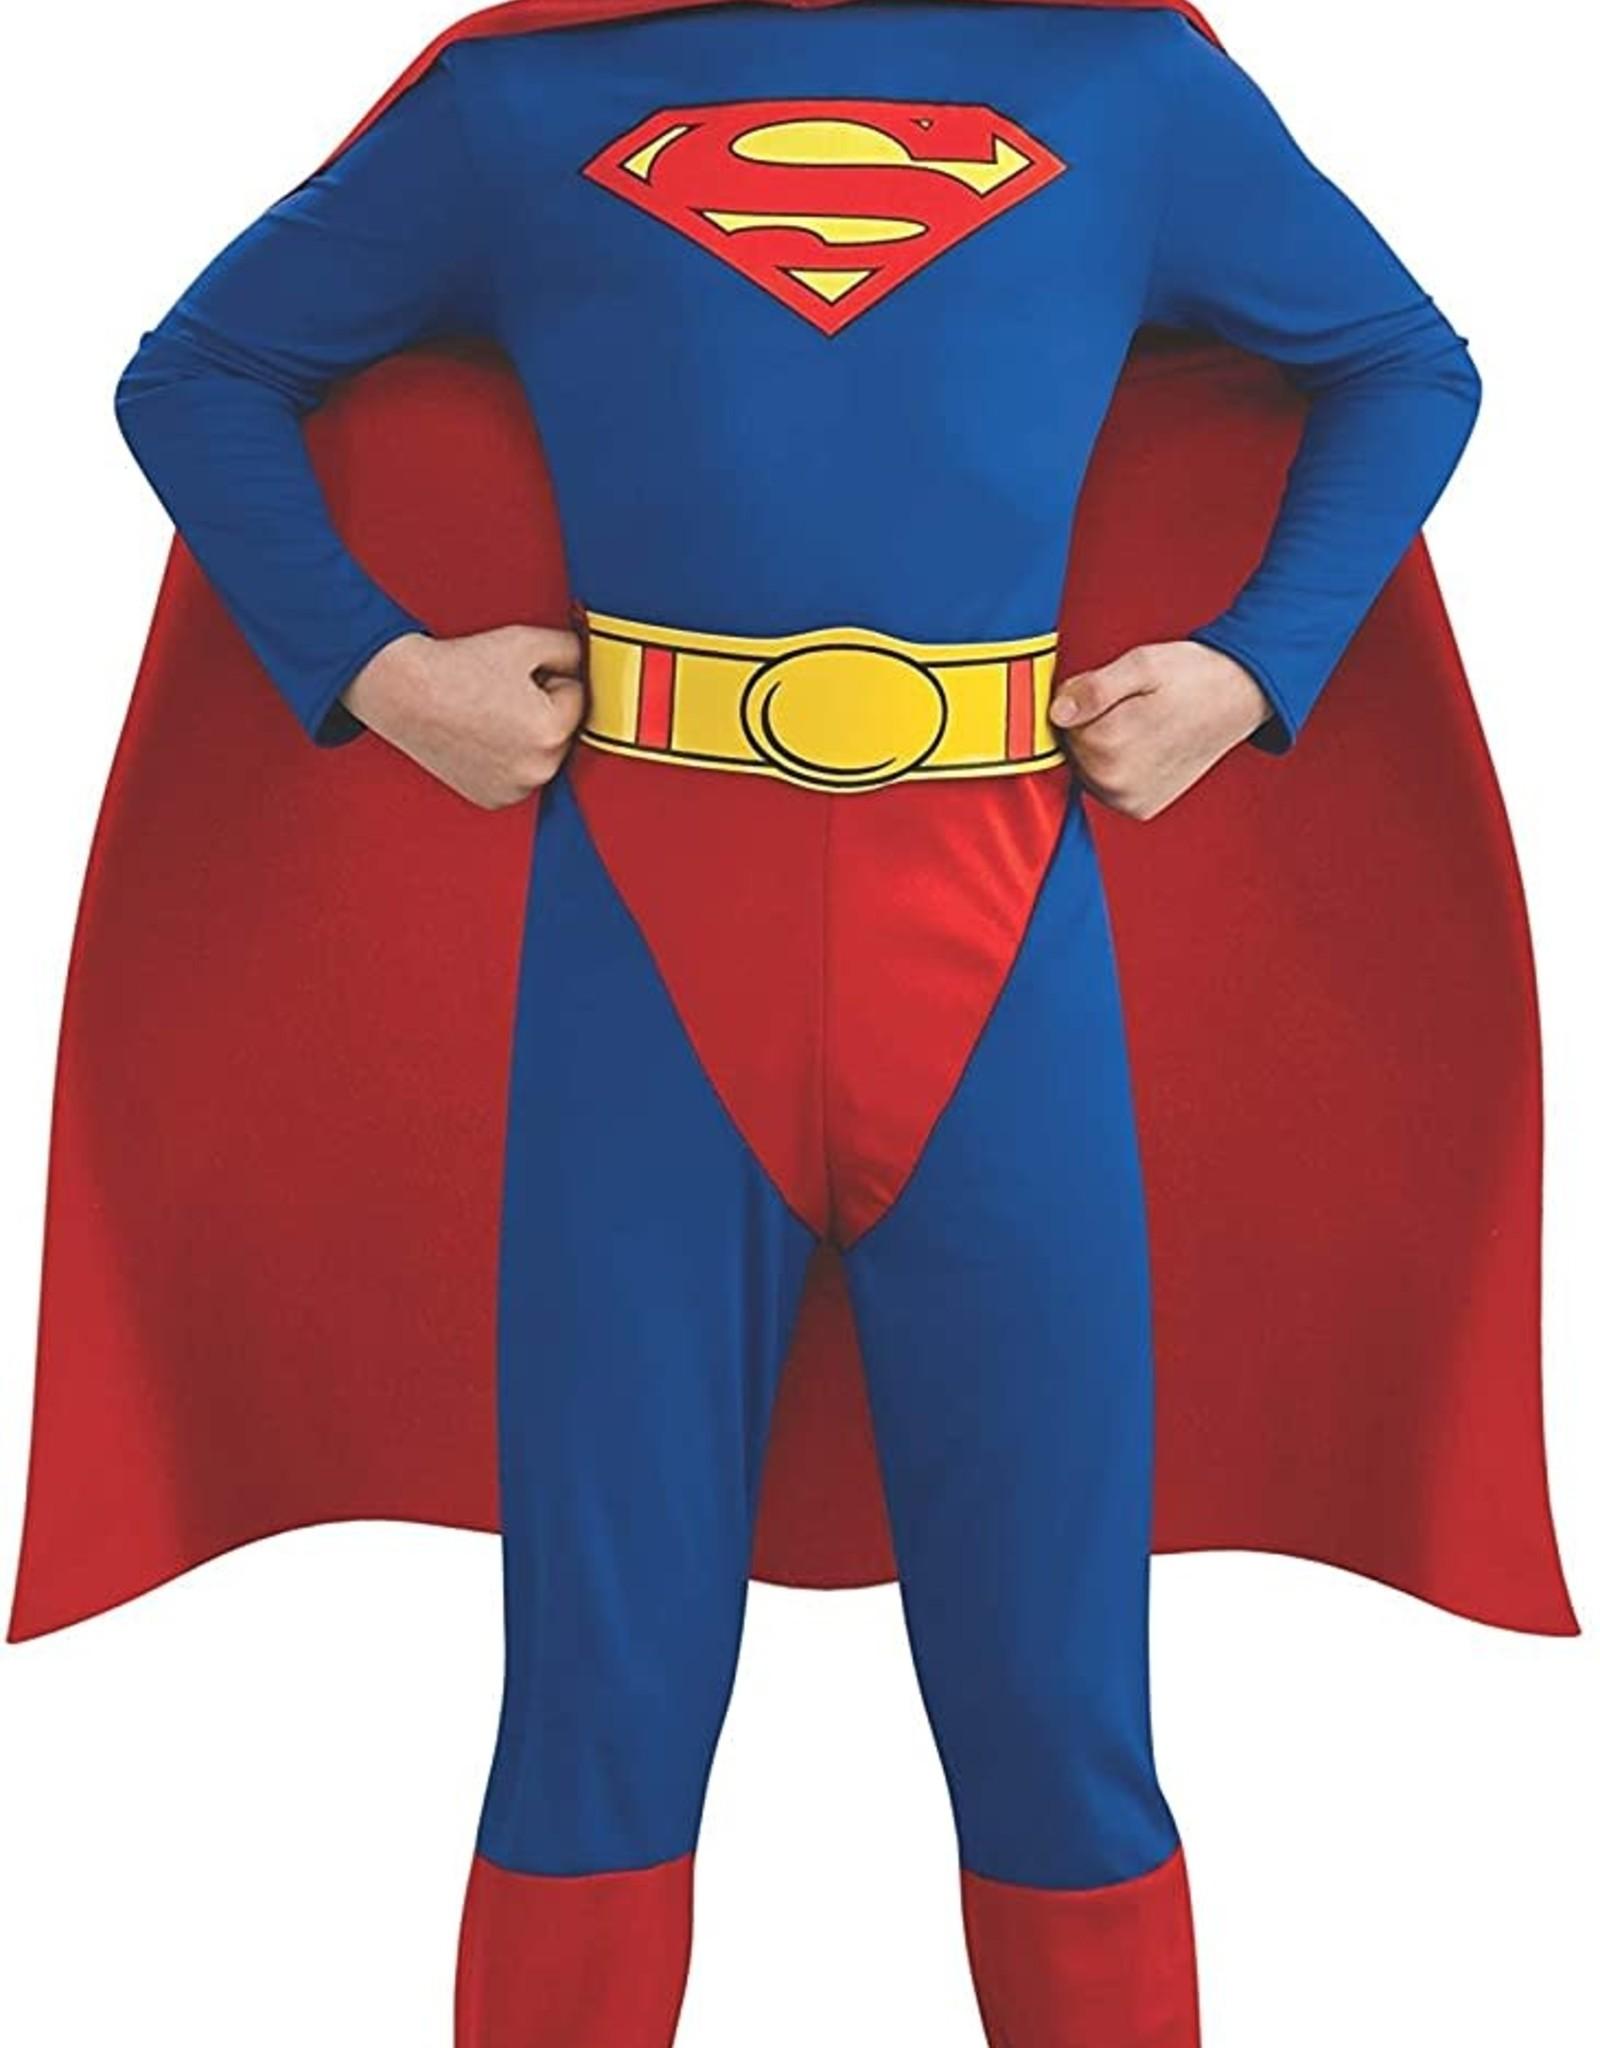 SUPERMAN BODY SUIT COSTUME